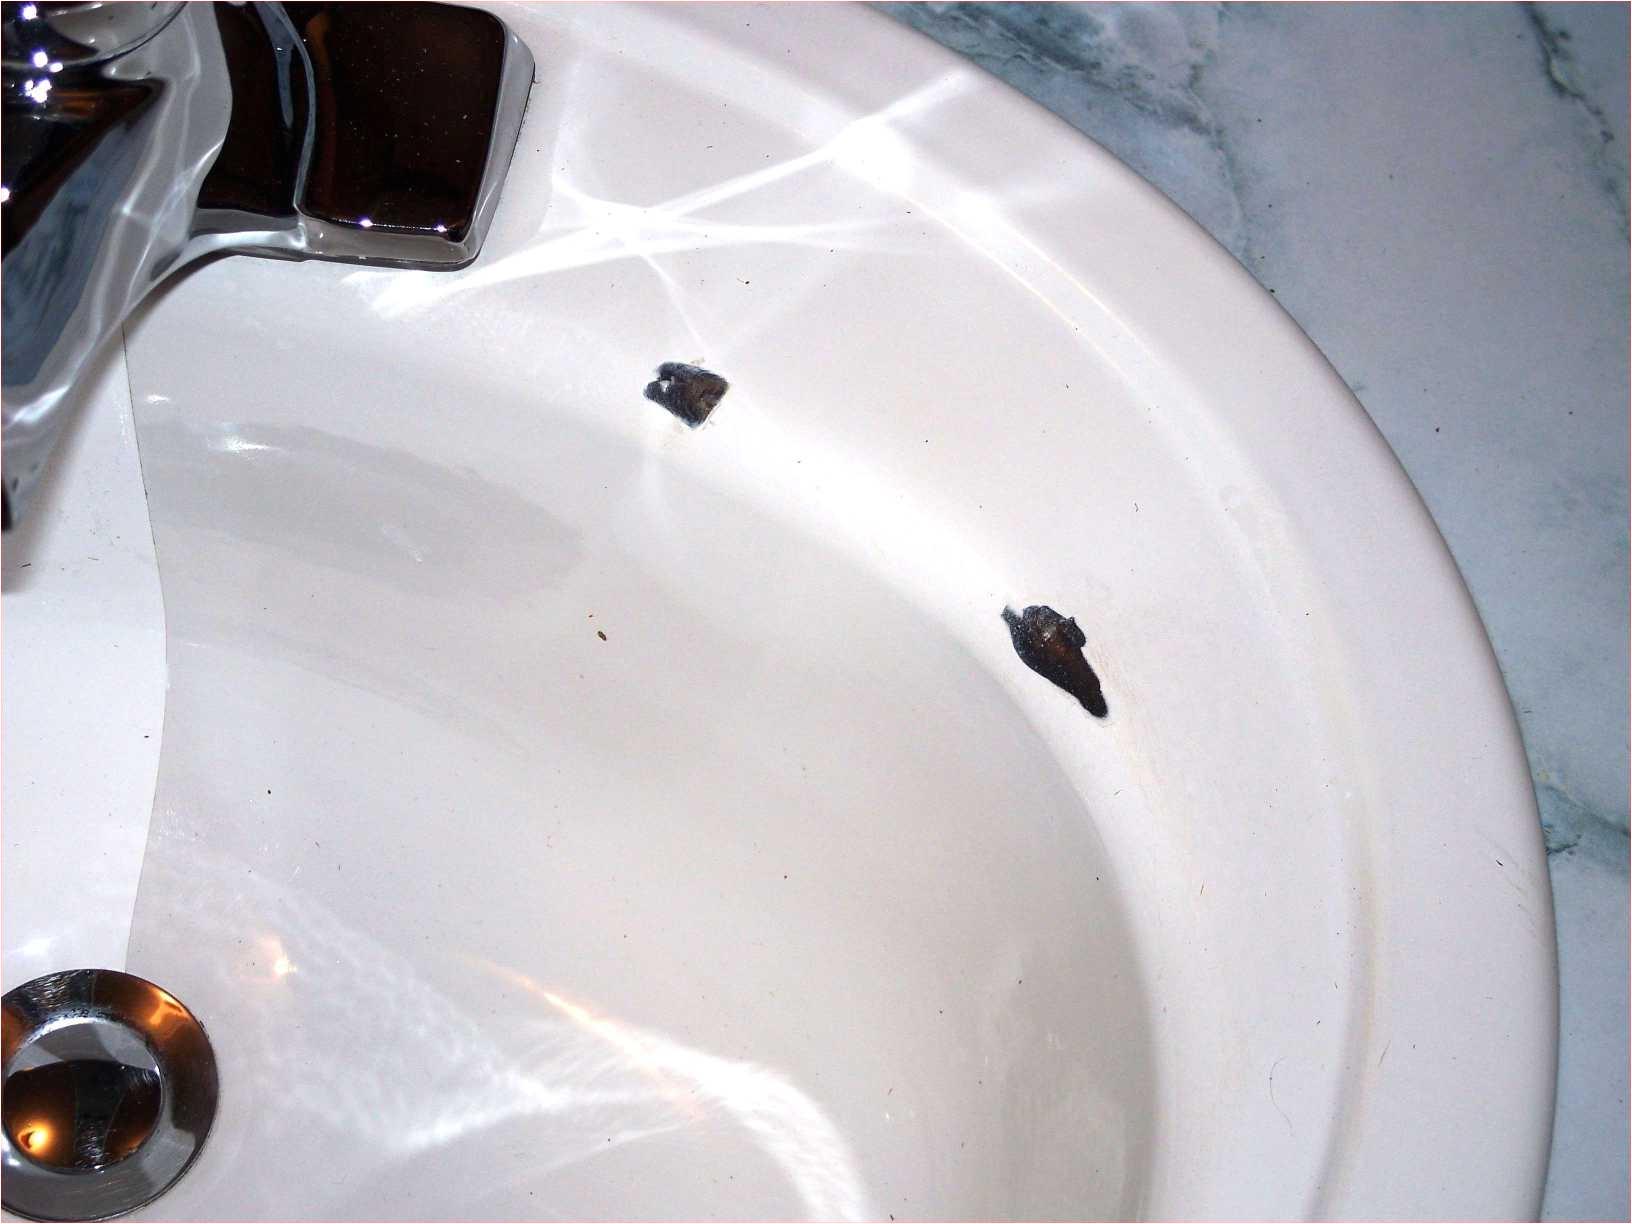 american standard shower faucet unique amazing bathtub repair elegant h sink bathroom faucets repair i 0d